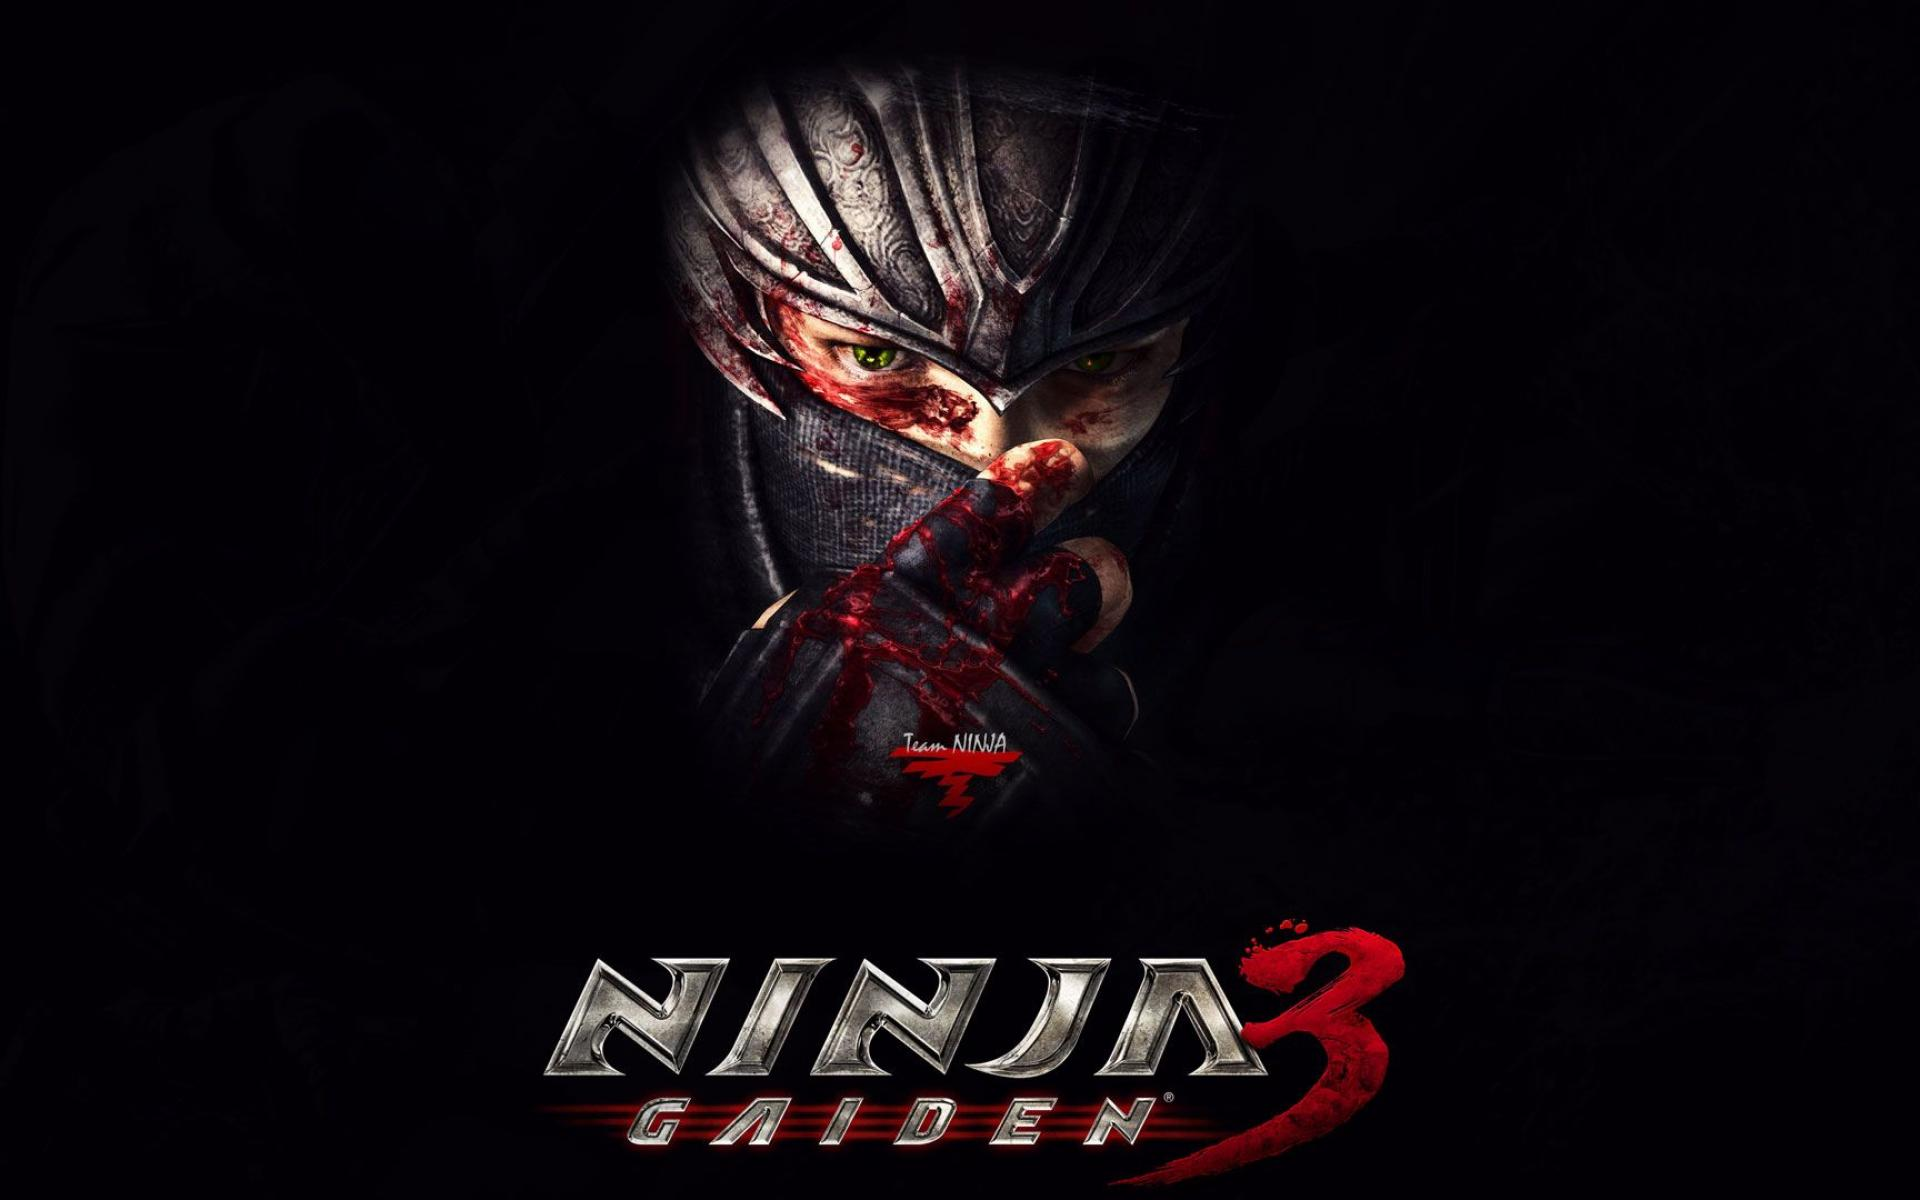 Wallpapers Videojuegos Ninja Gaiden 3